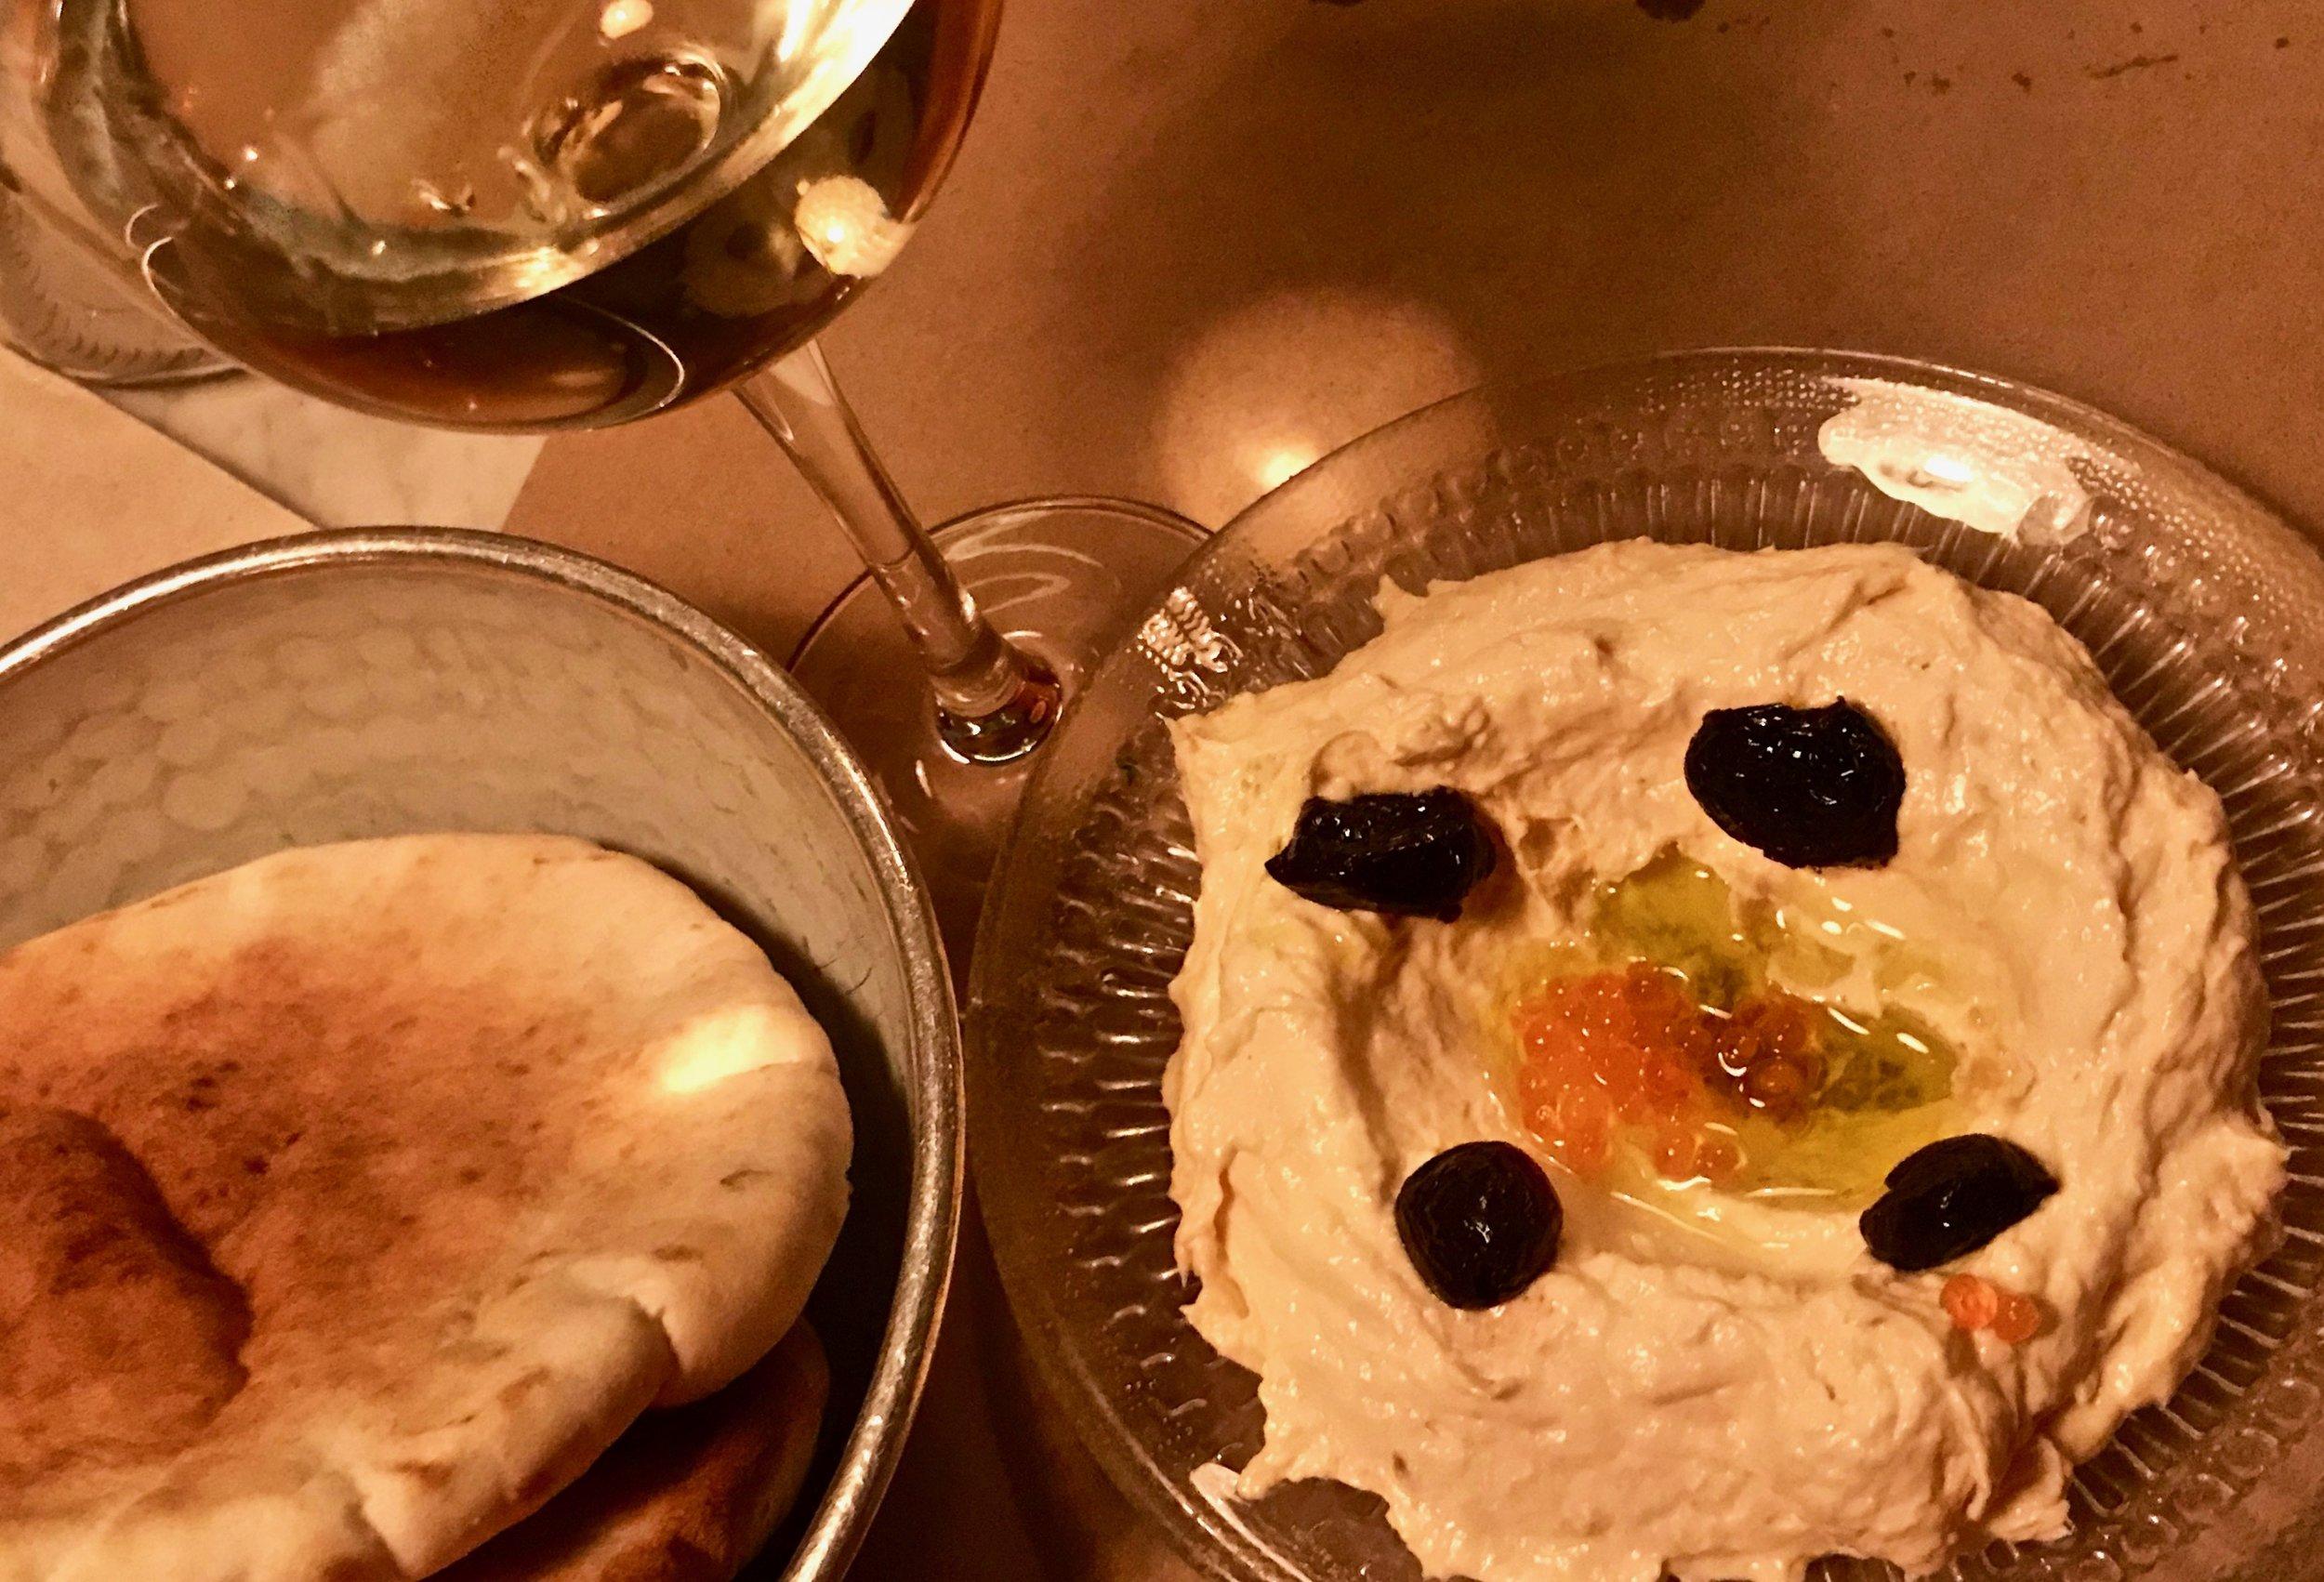 A very fine version of taramasalata, a classic Mediterranean fish spread.